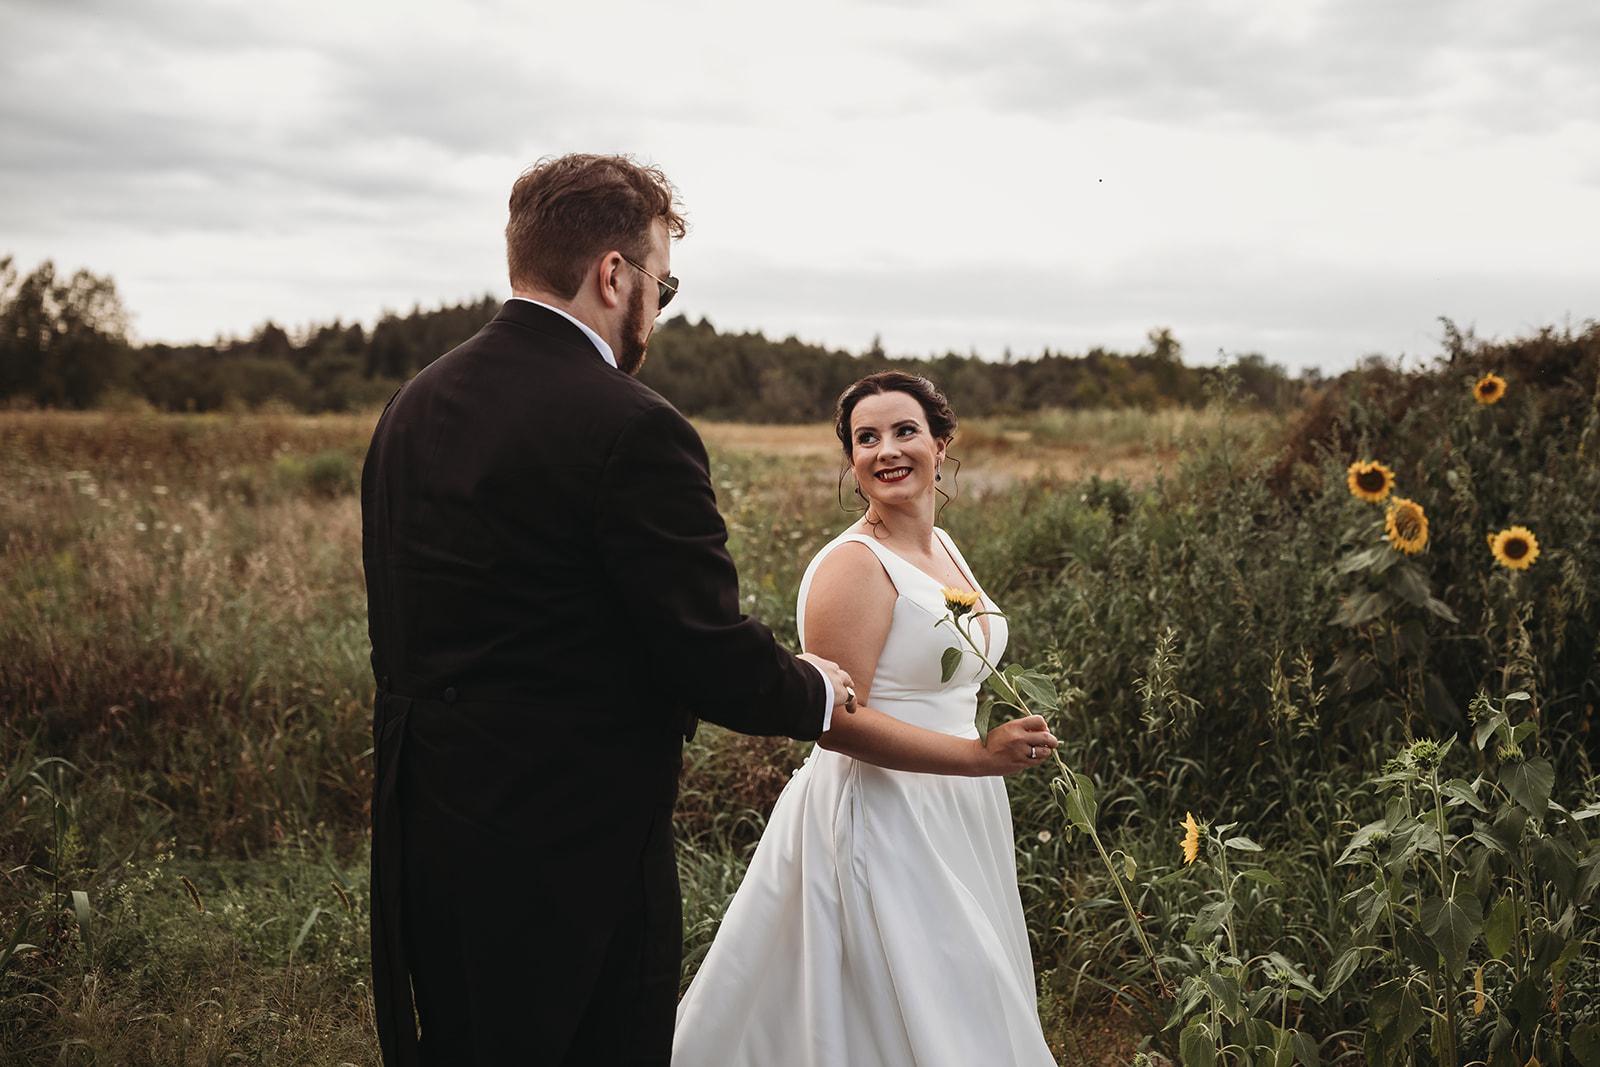 Reasons To Do A First Look ten2ten photography